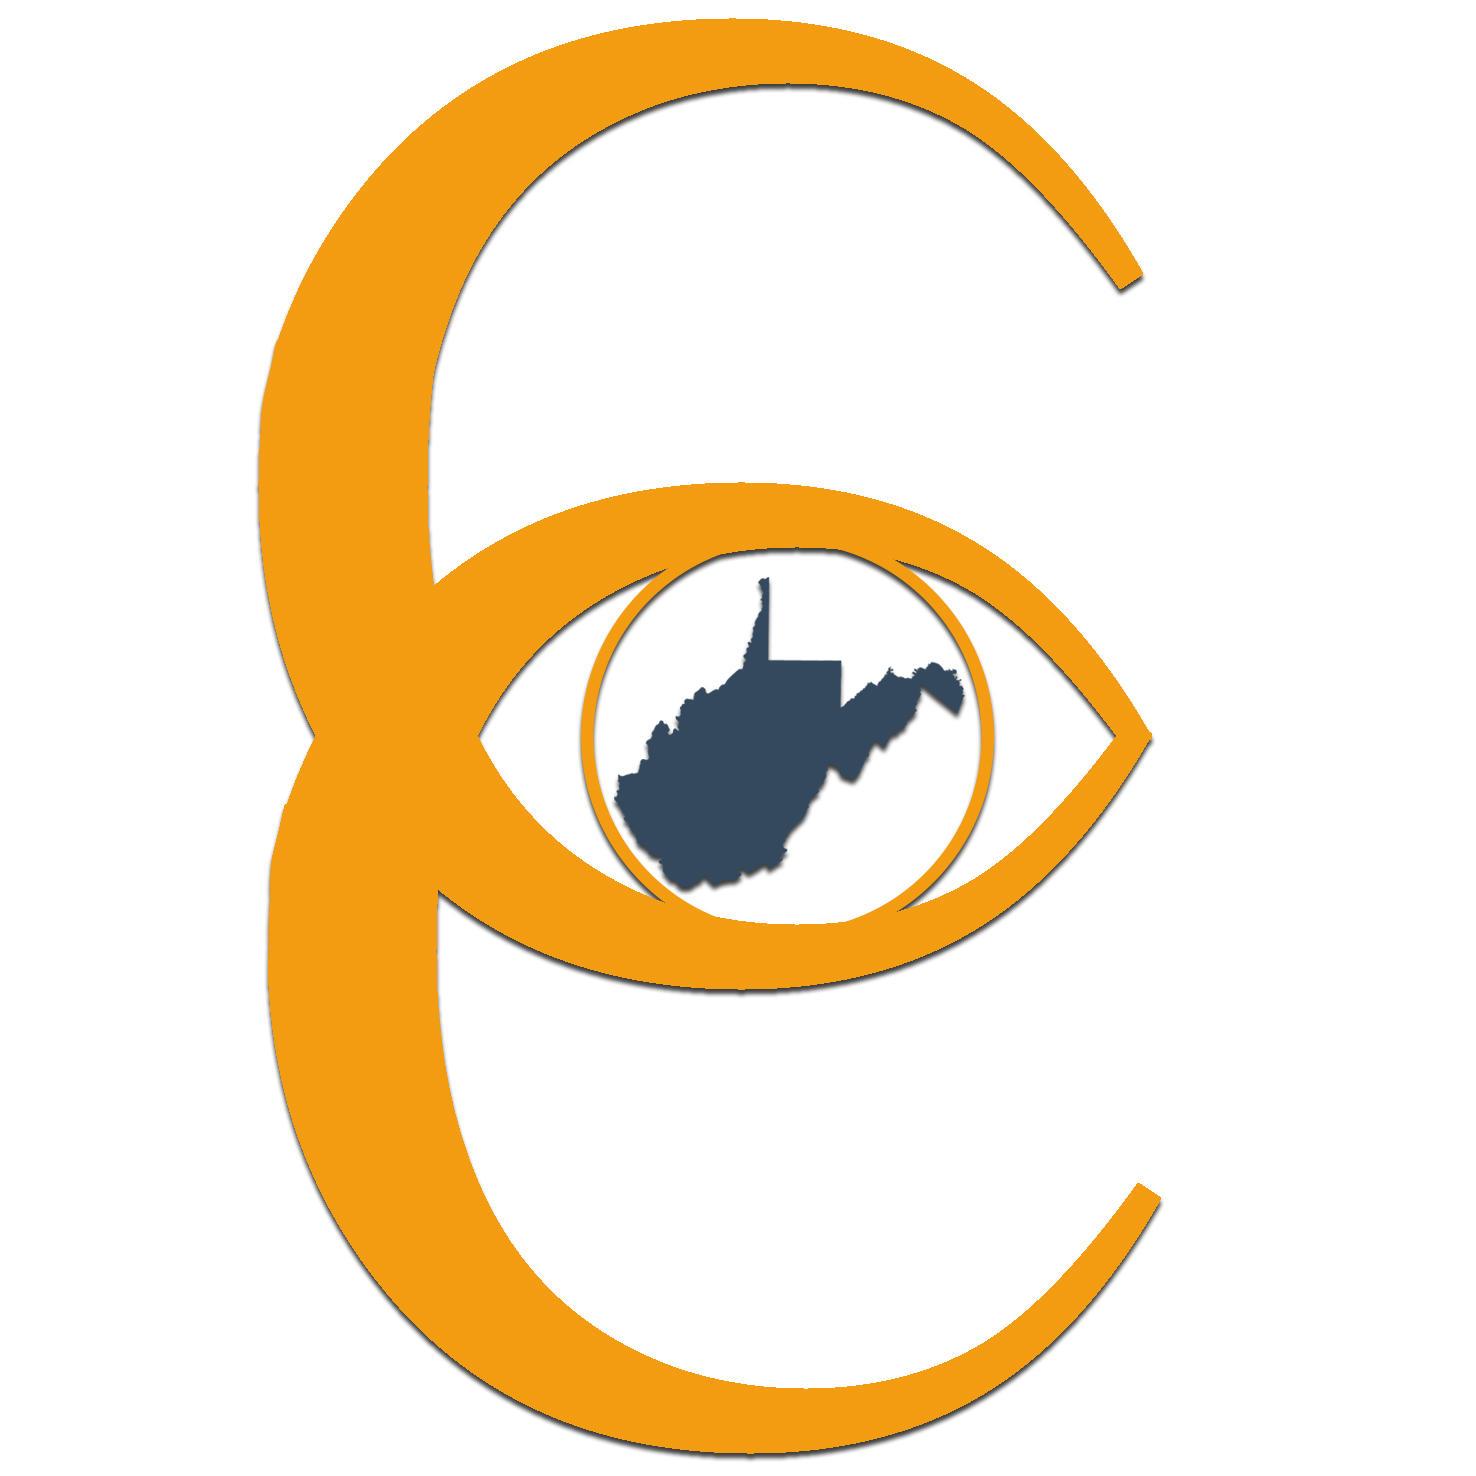 West Virginia Cornea & Cataract Center Of Excellence